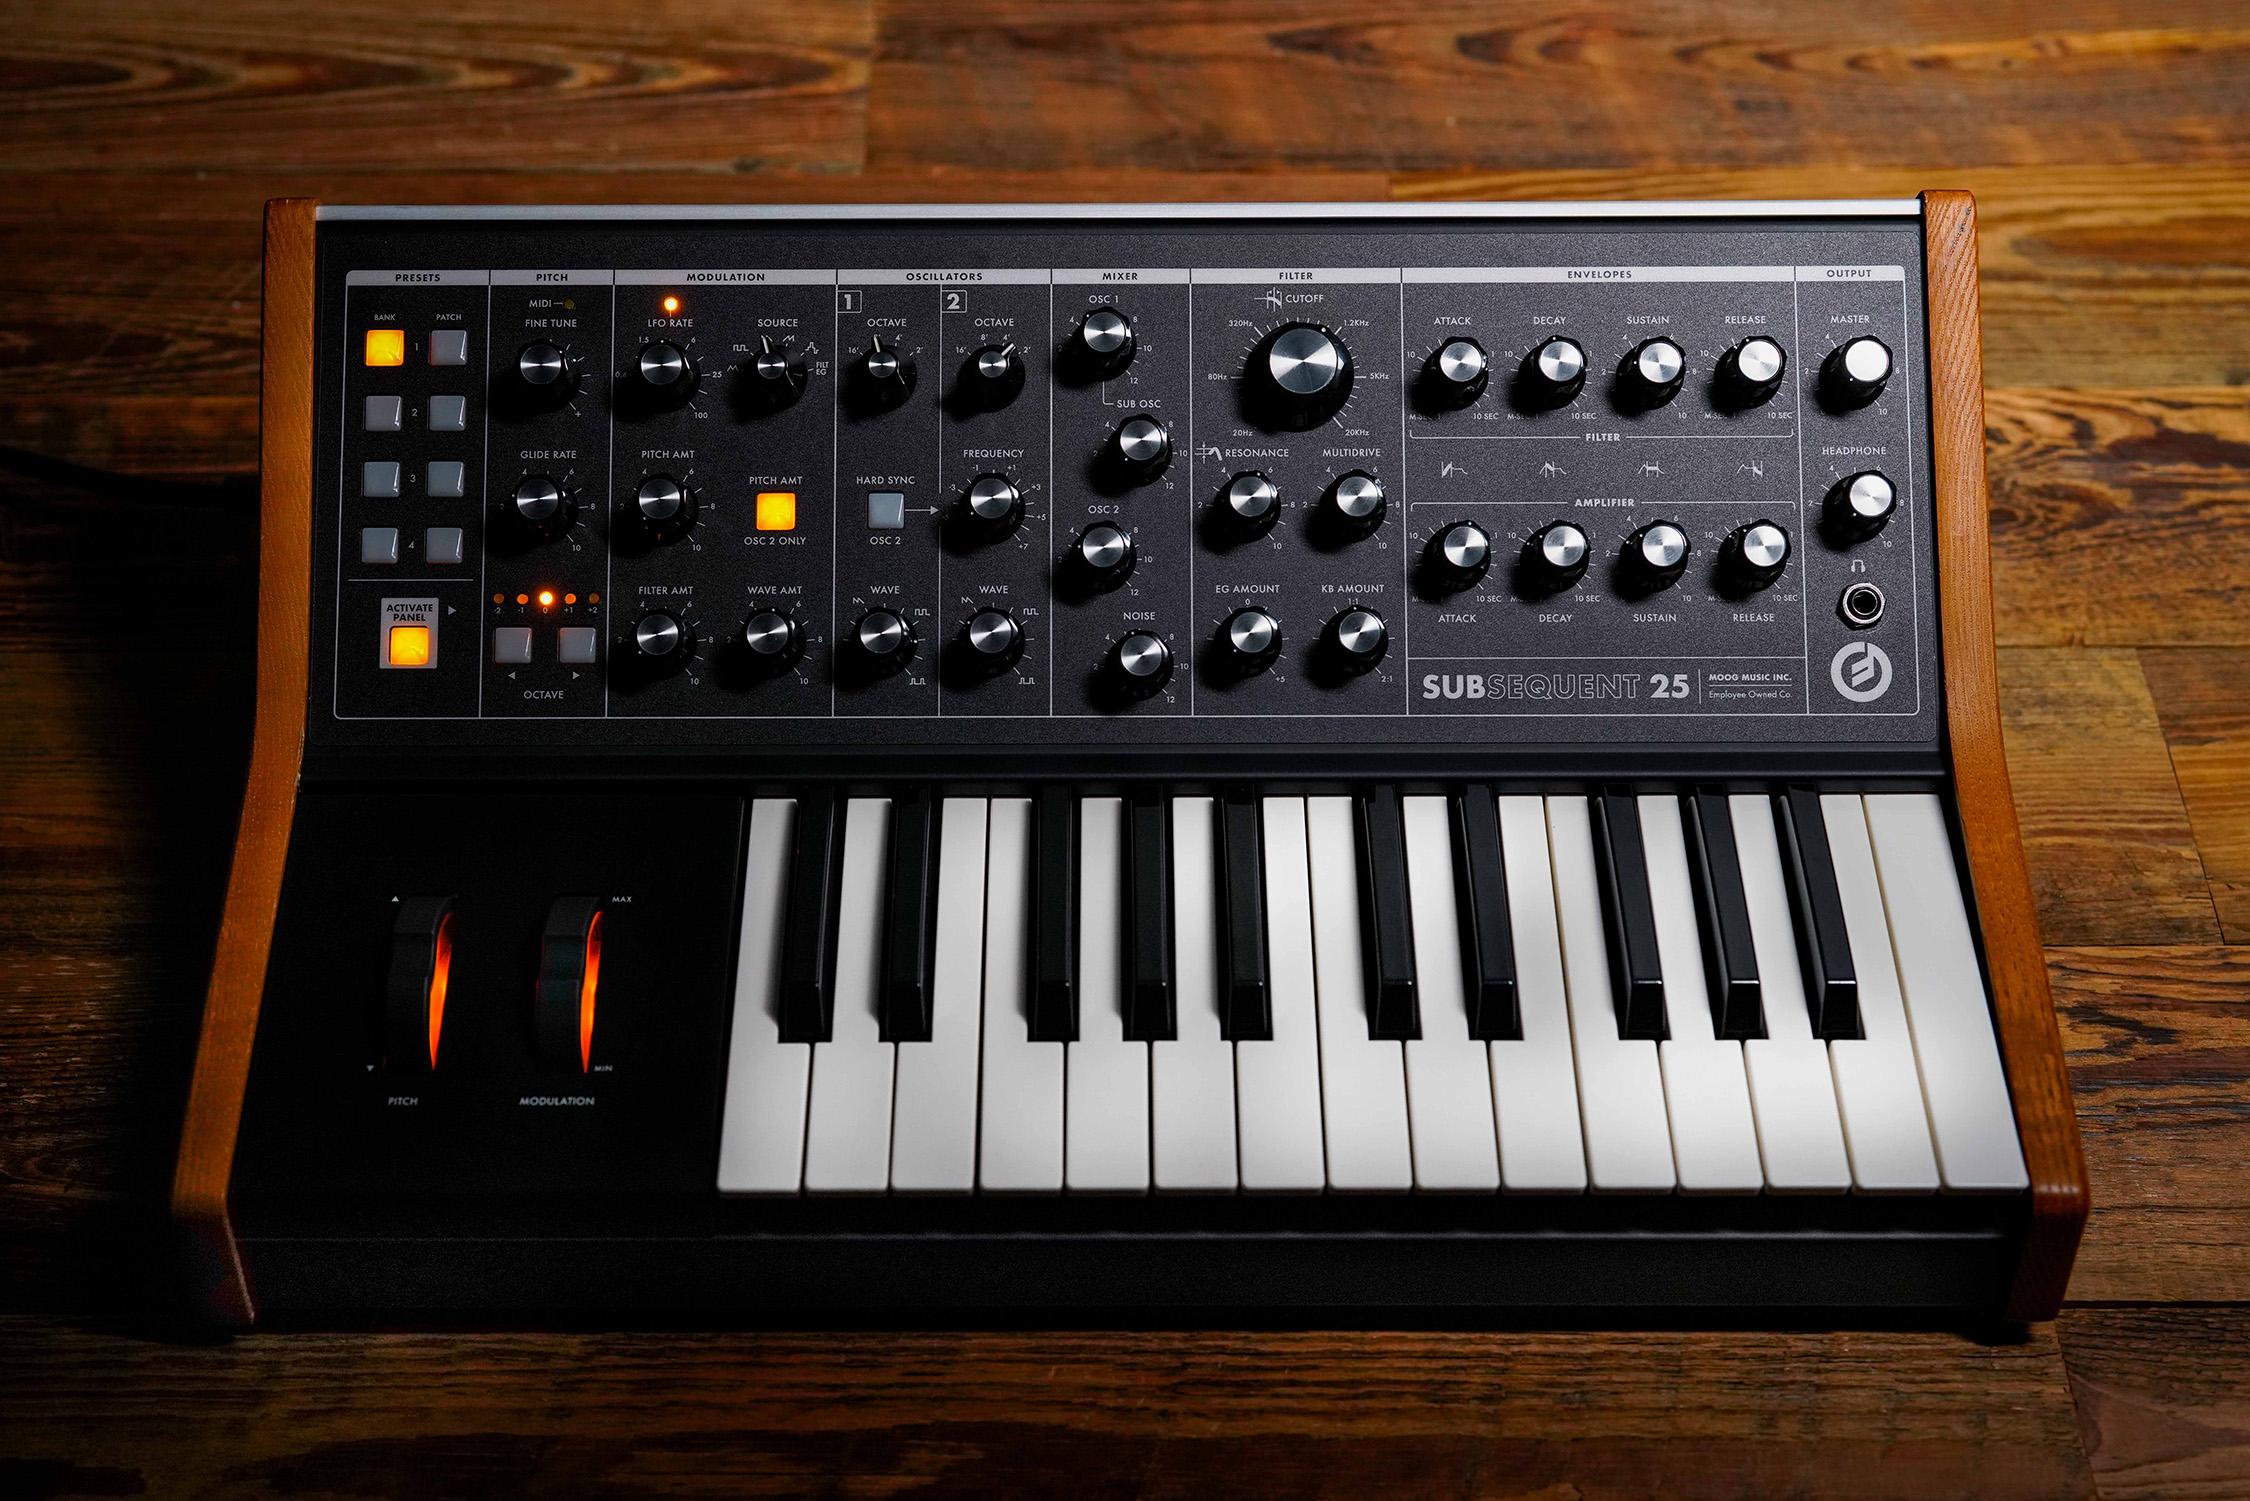 Moog Subsequent 25 – Kompakt parafonisk analogsynt